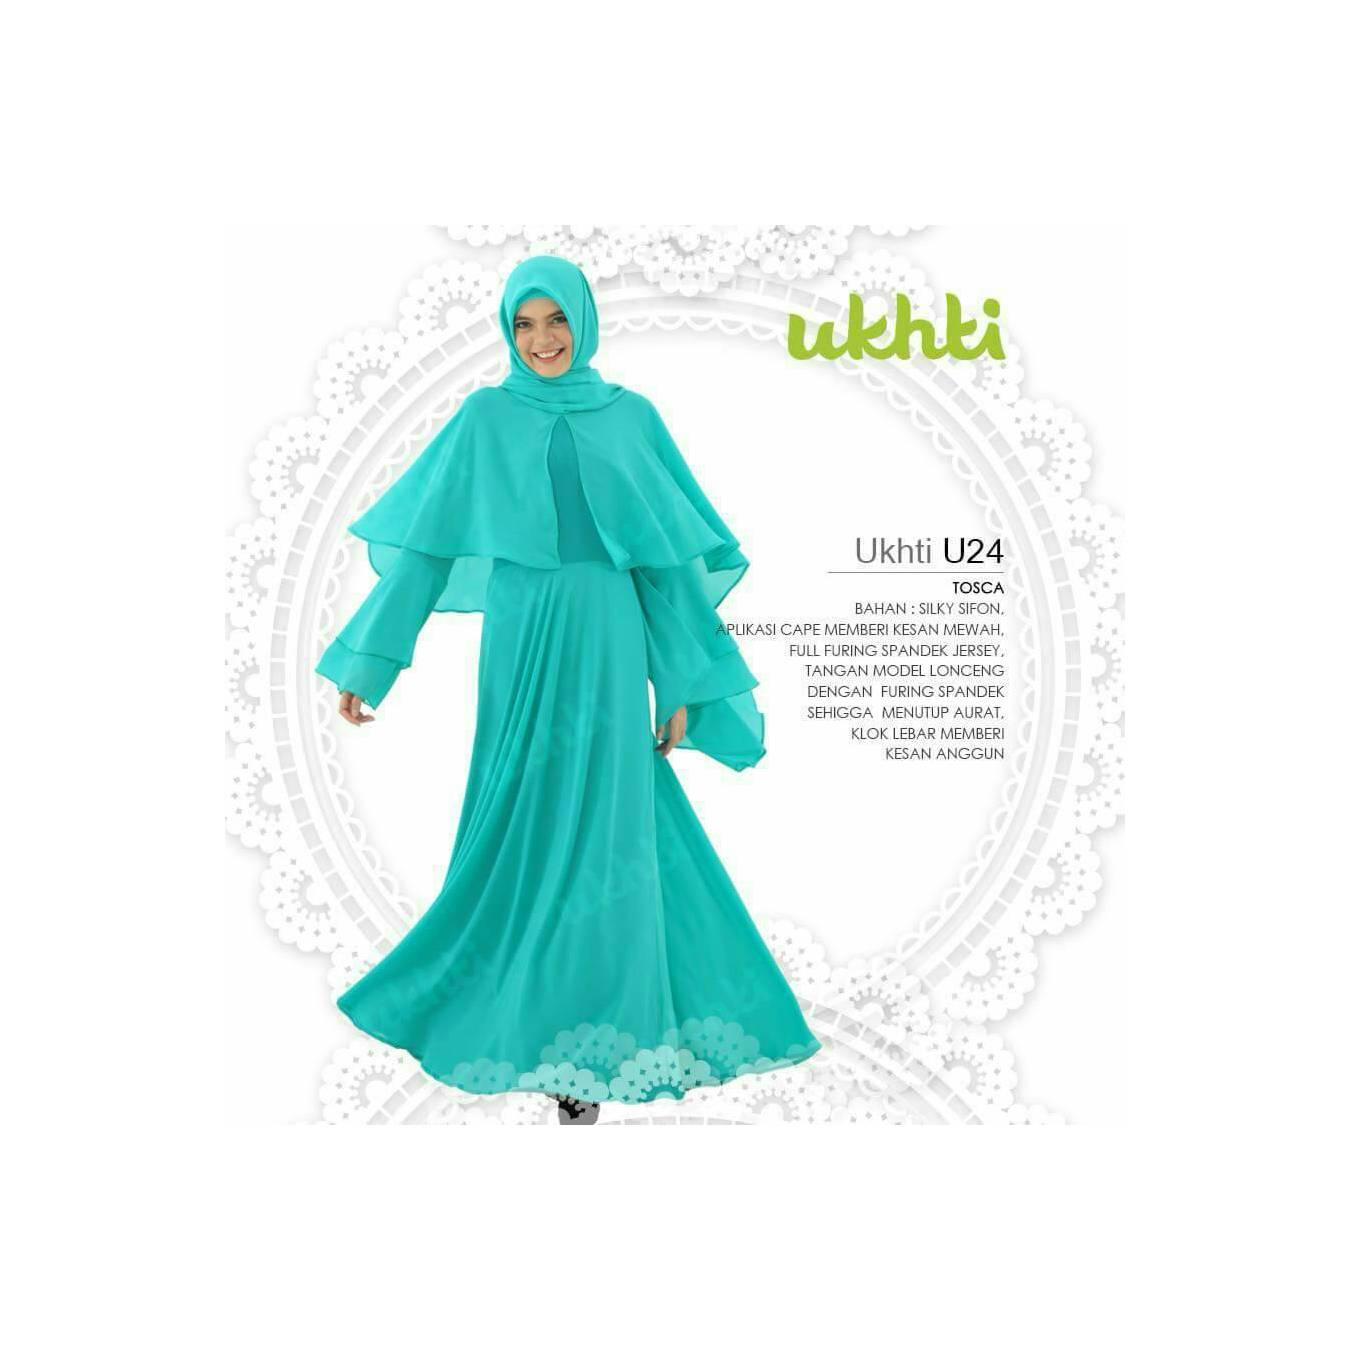 PROMO! Gamis Ukhti U 24 Size XL Bahan Silky Sifon